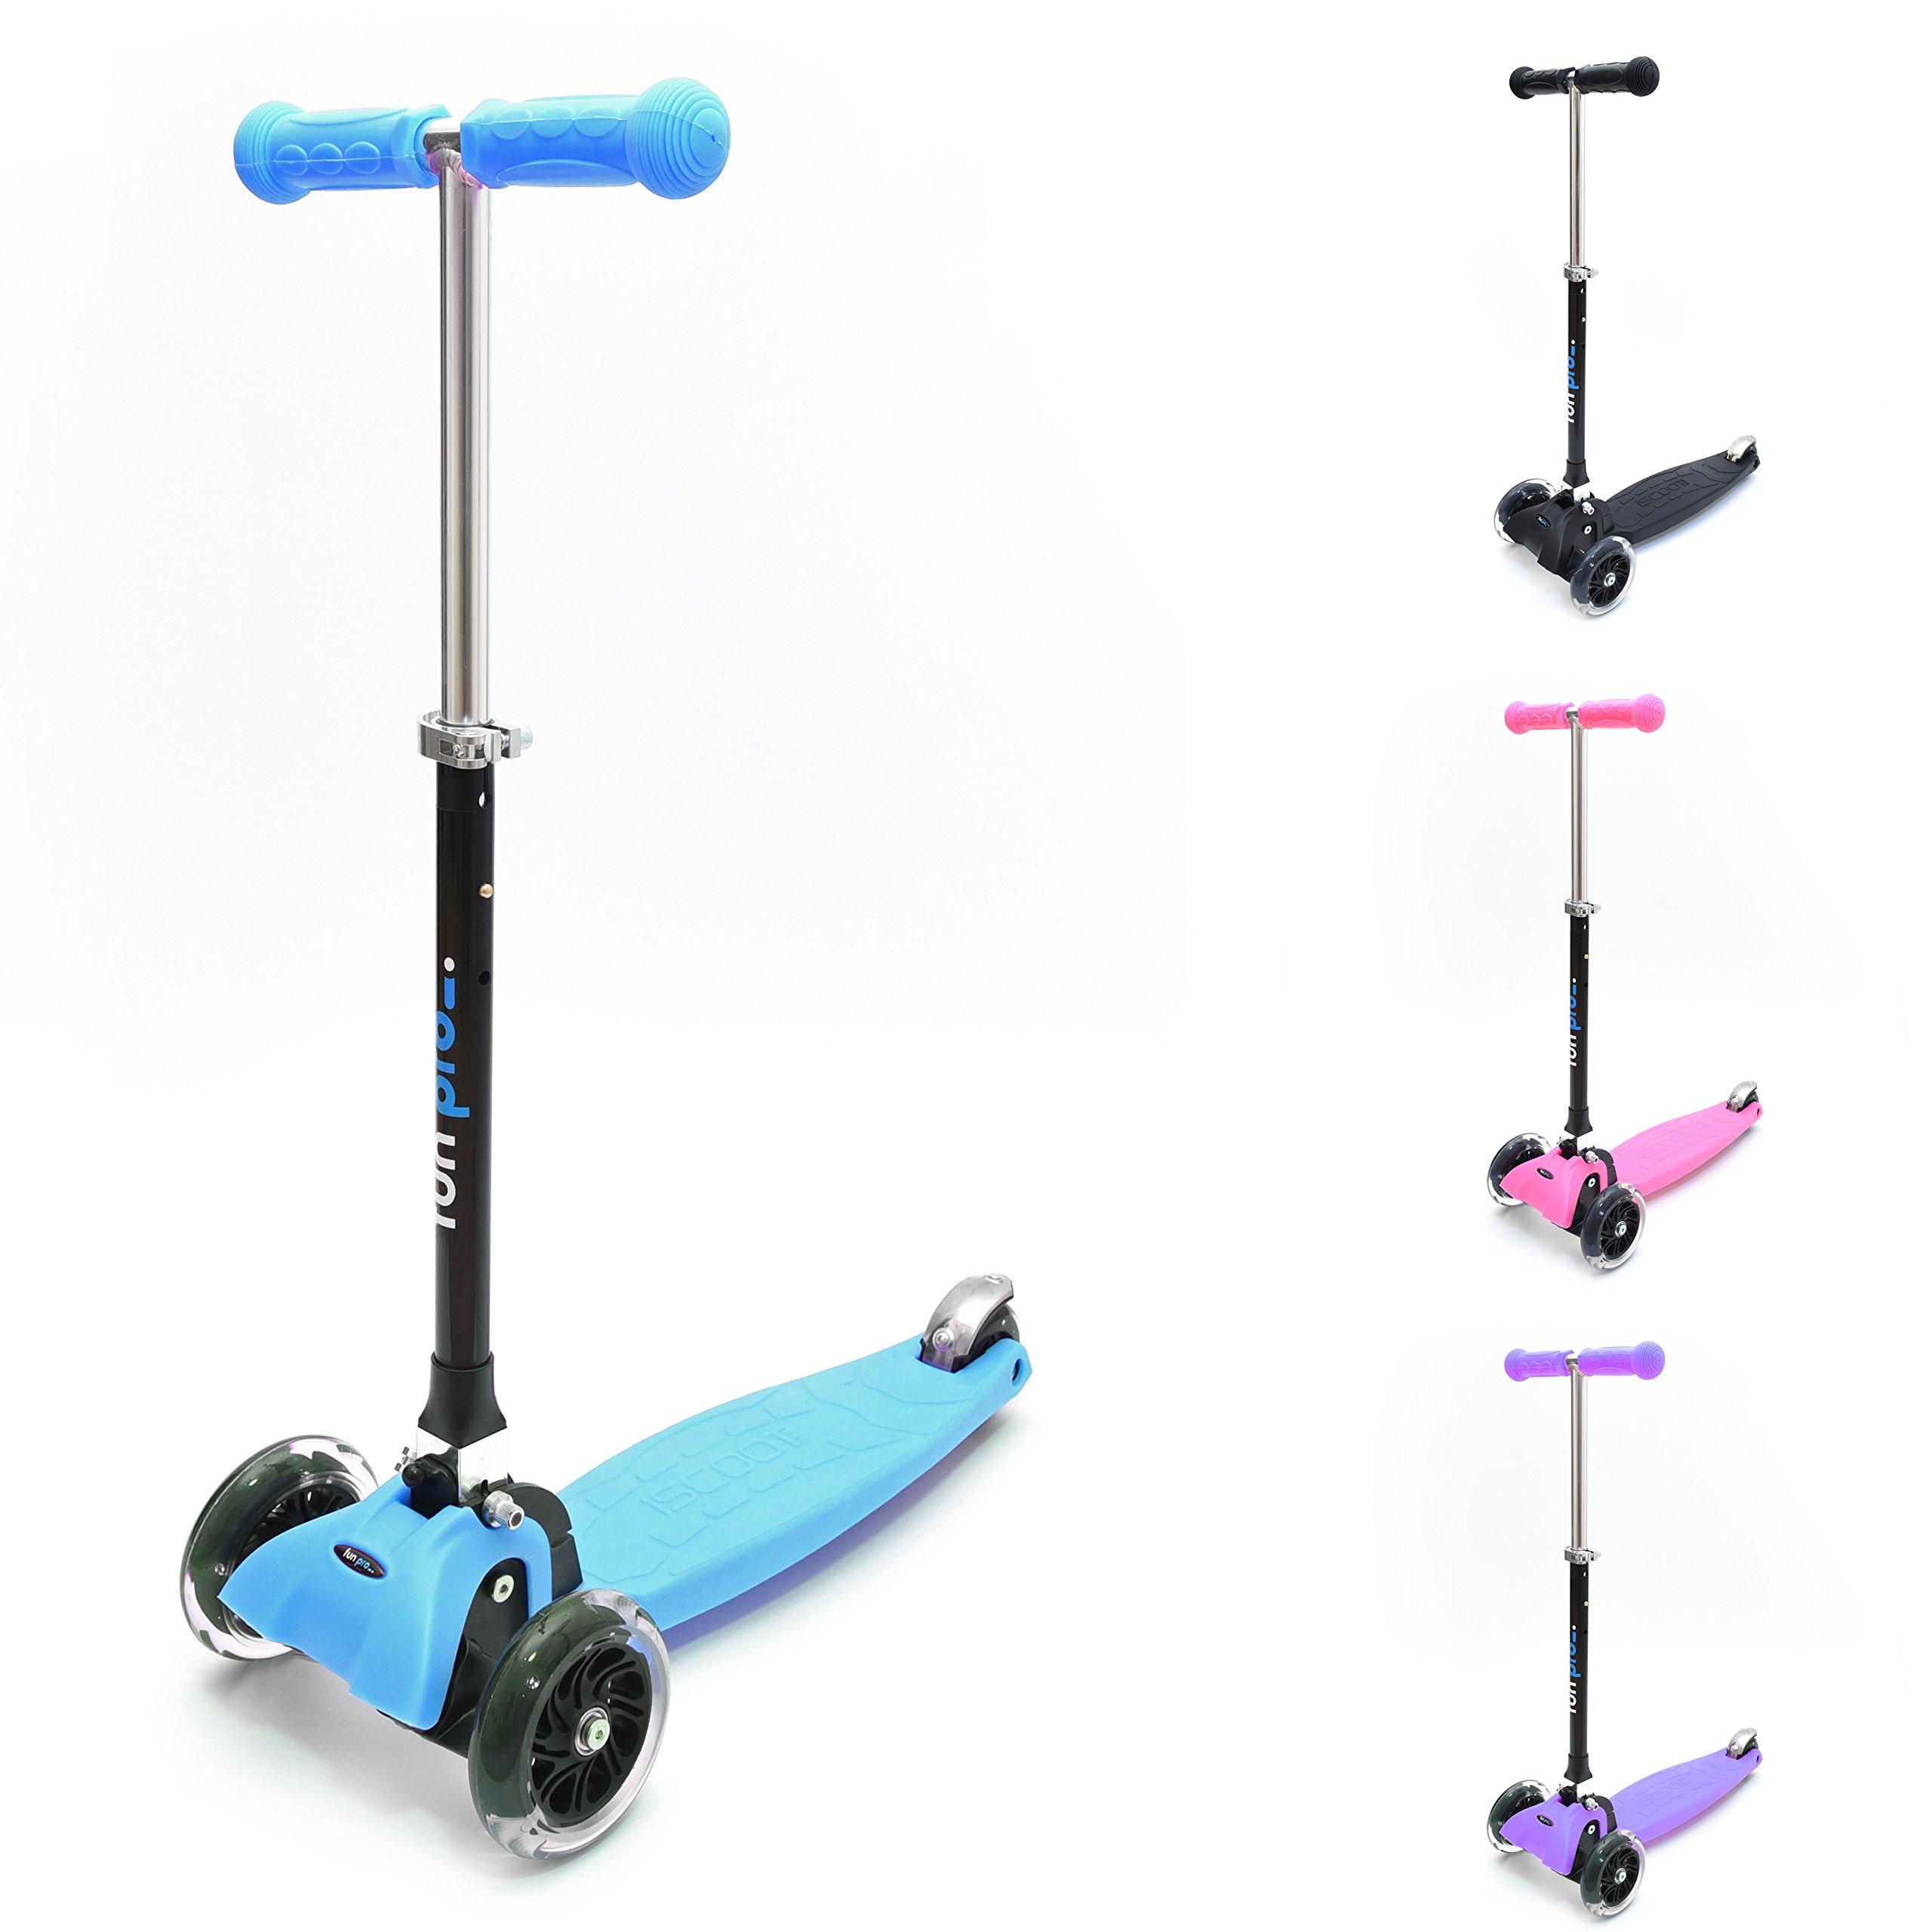 fun pro ONE Kids Scooter (kickboard) 2, 3, 4, 5, 6 Years, LED Light up Wheels, Foldable